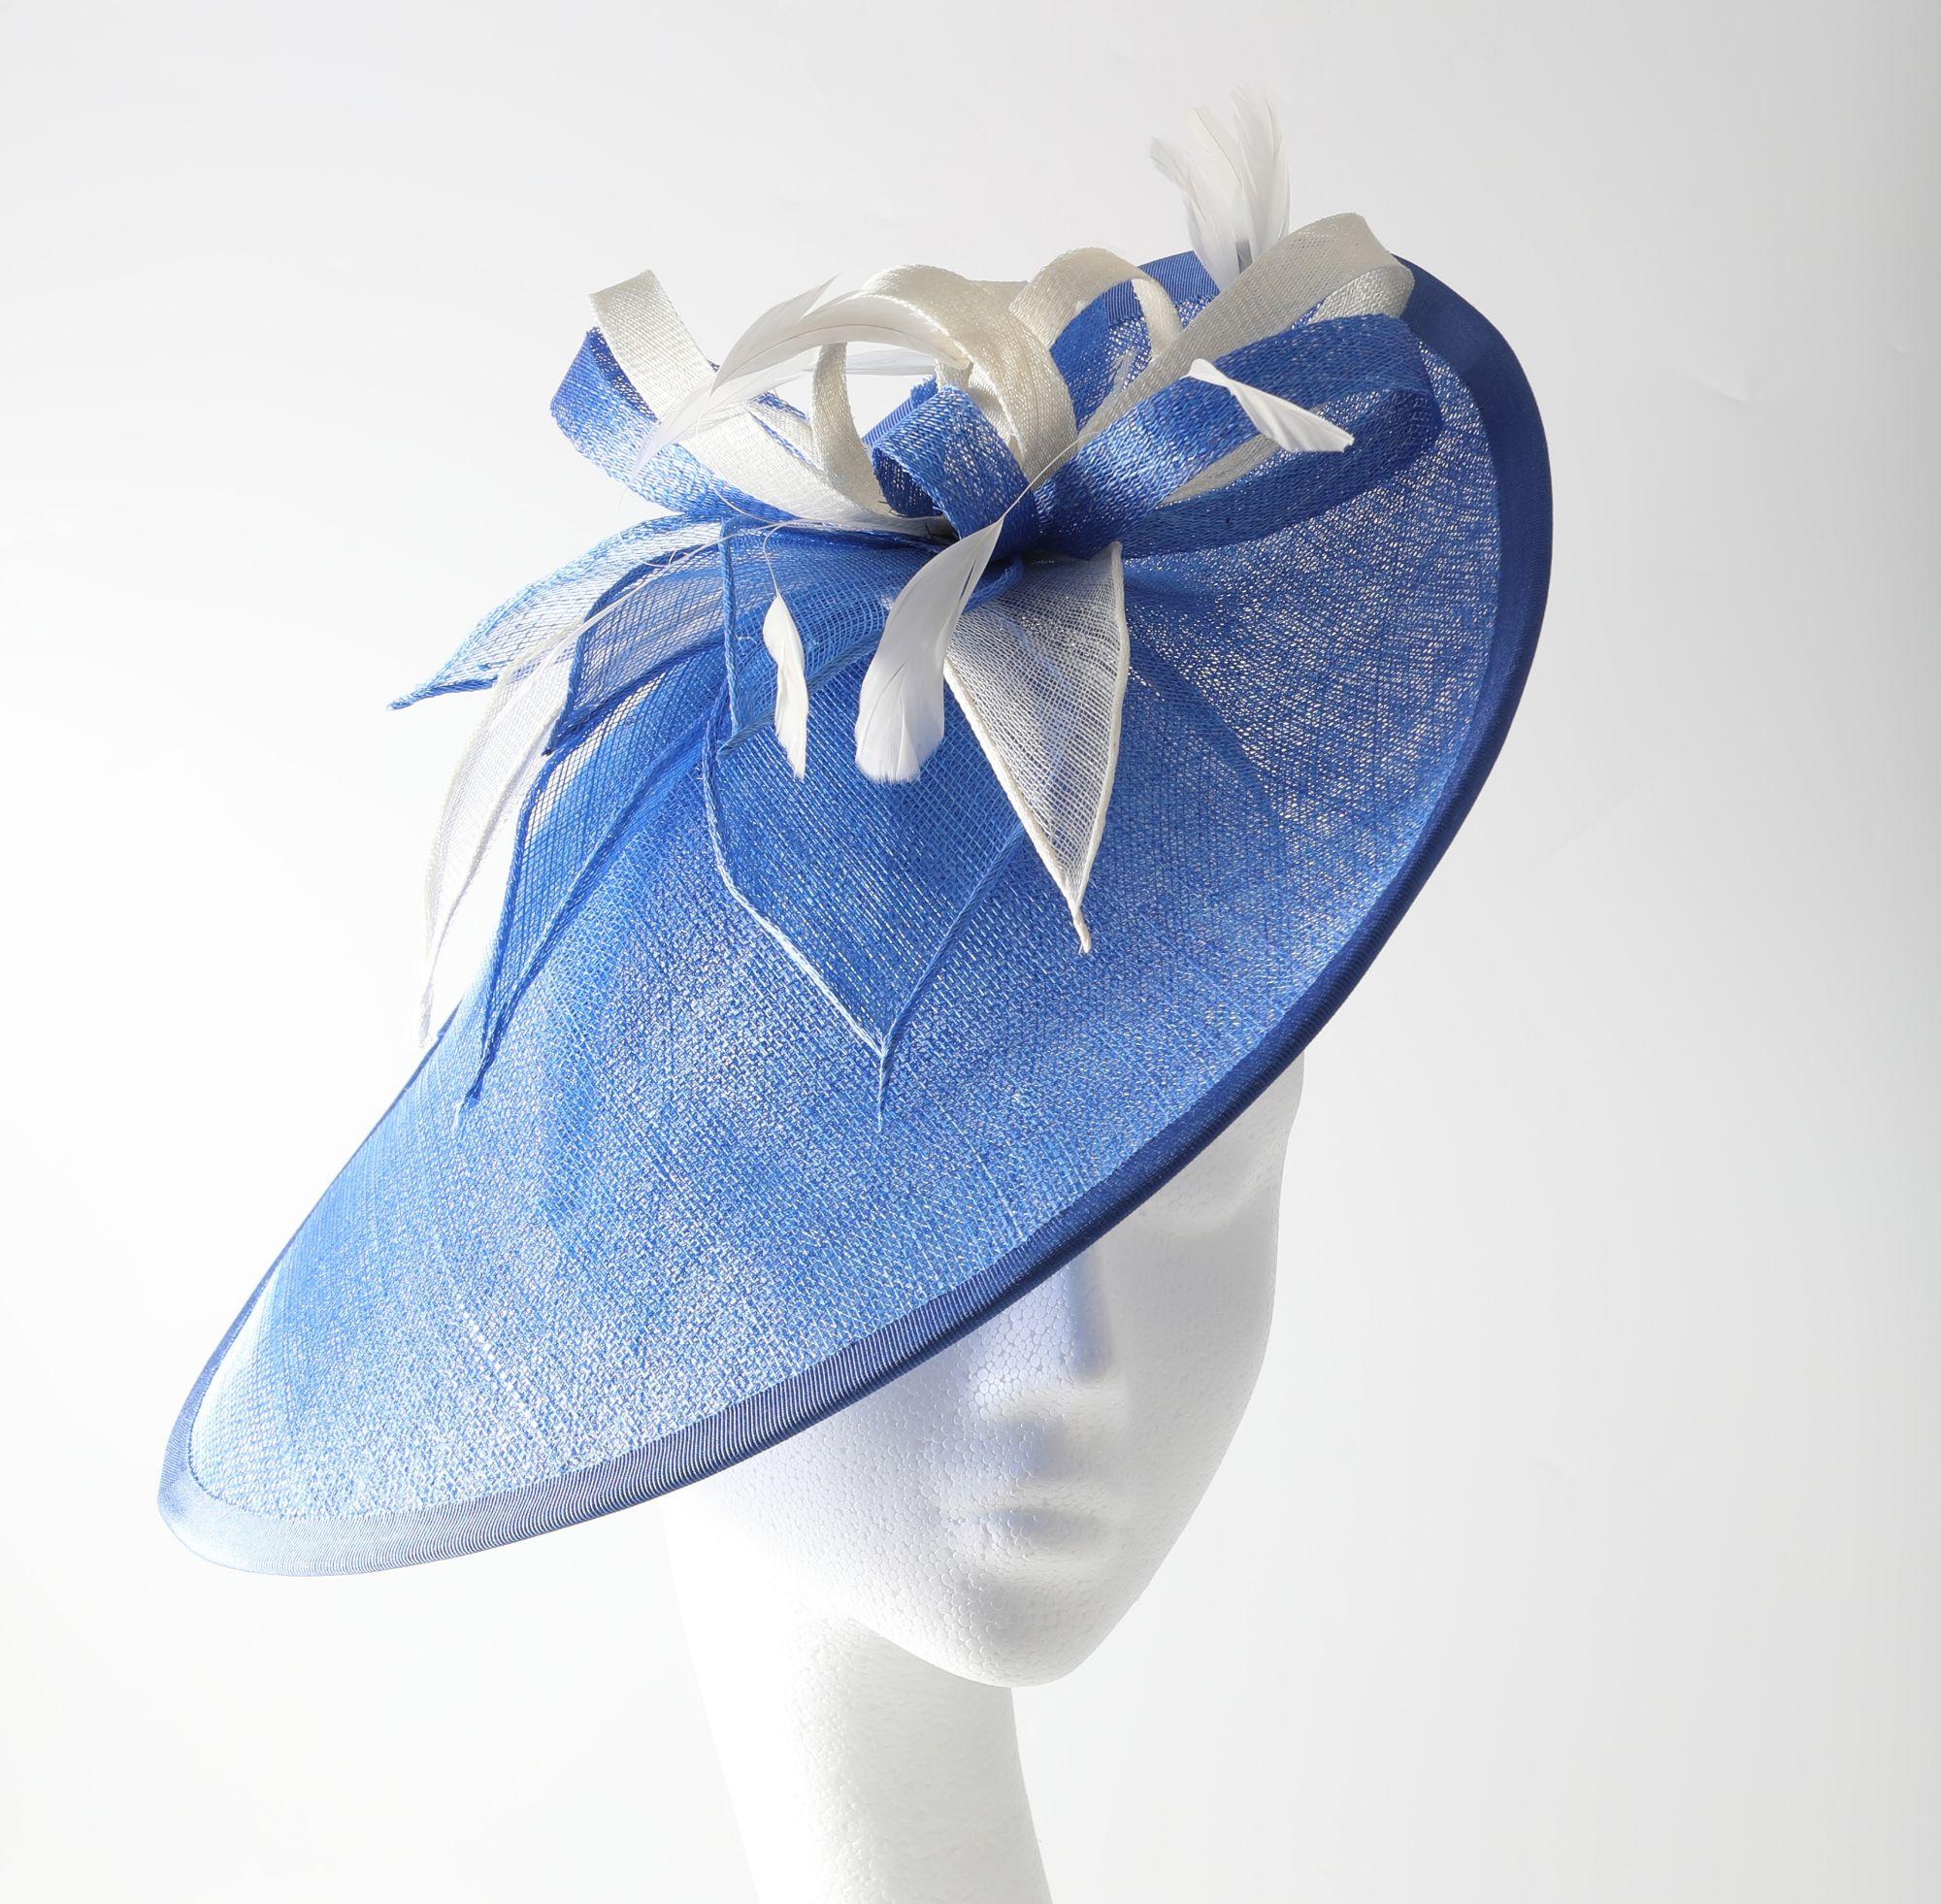 Made To Measure Bespoke Hats In Chichester Roxanne Willard Hats